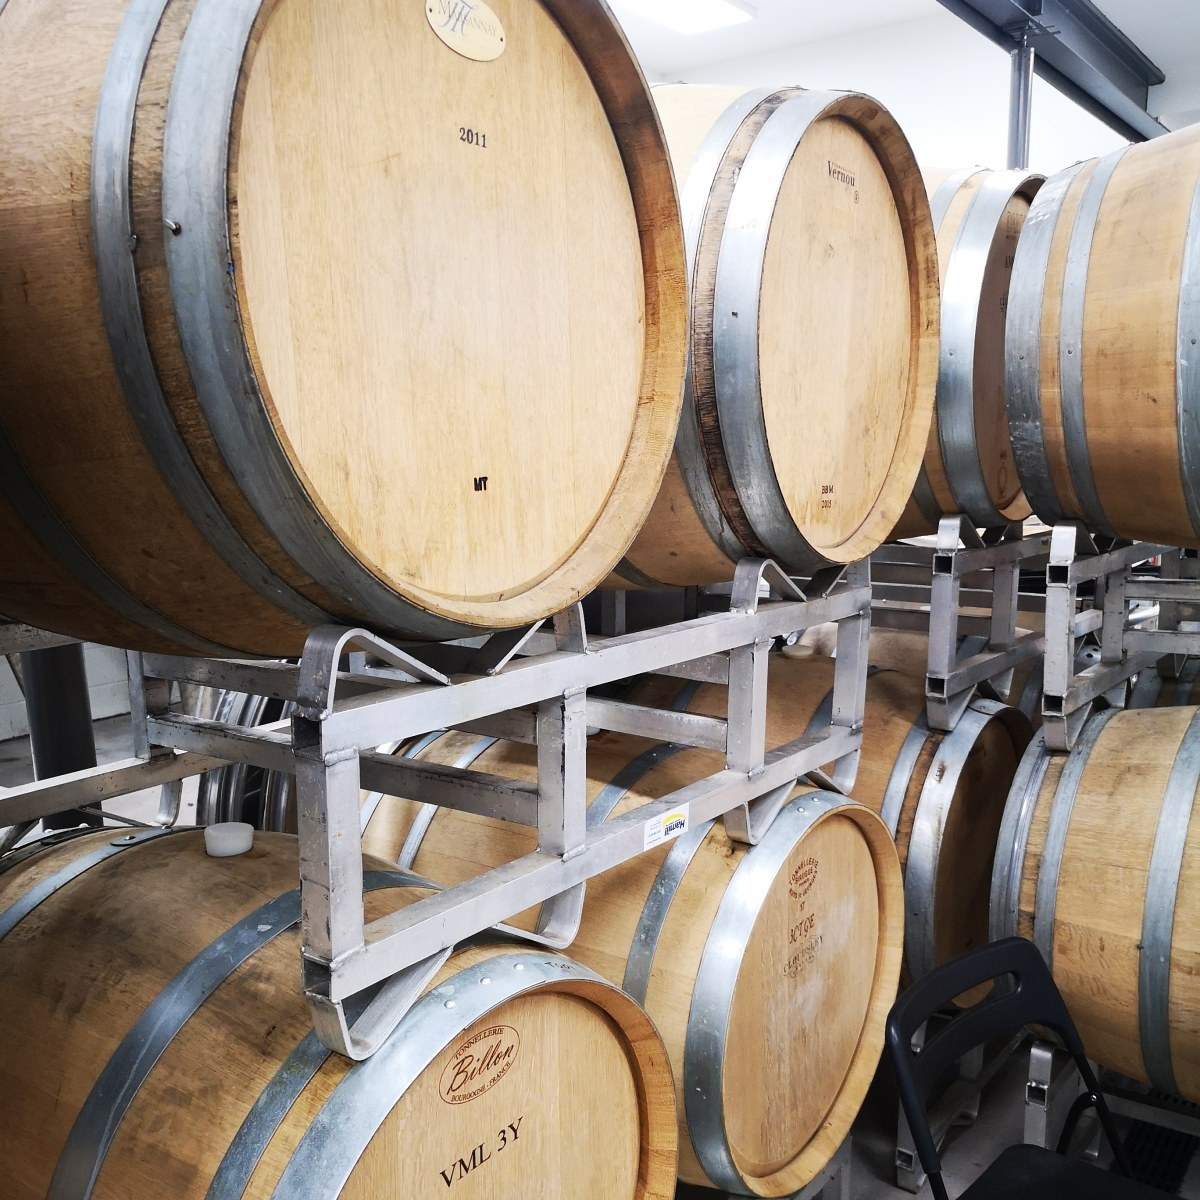 Review of Cloudsley Cellars: Niagara Region Wine Country